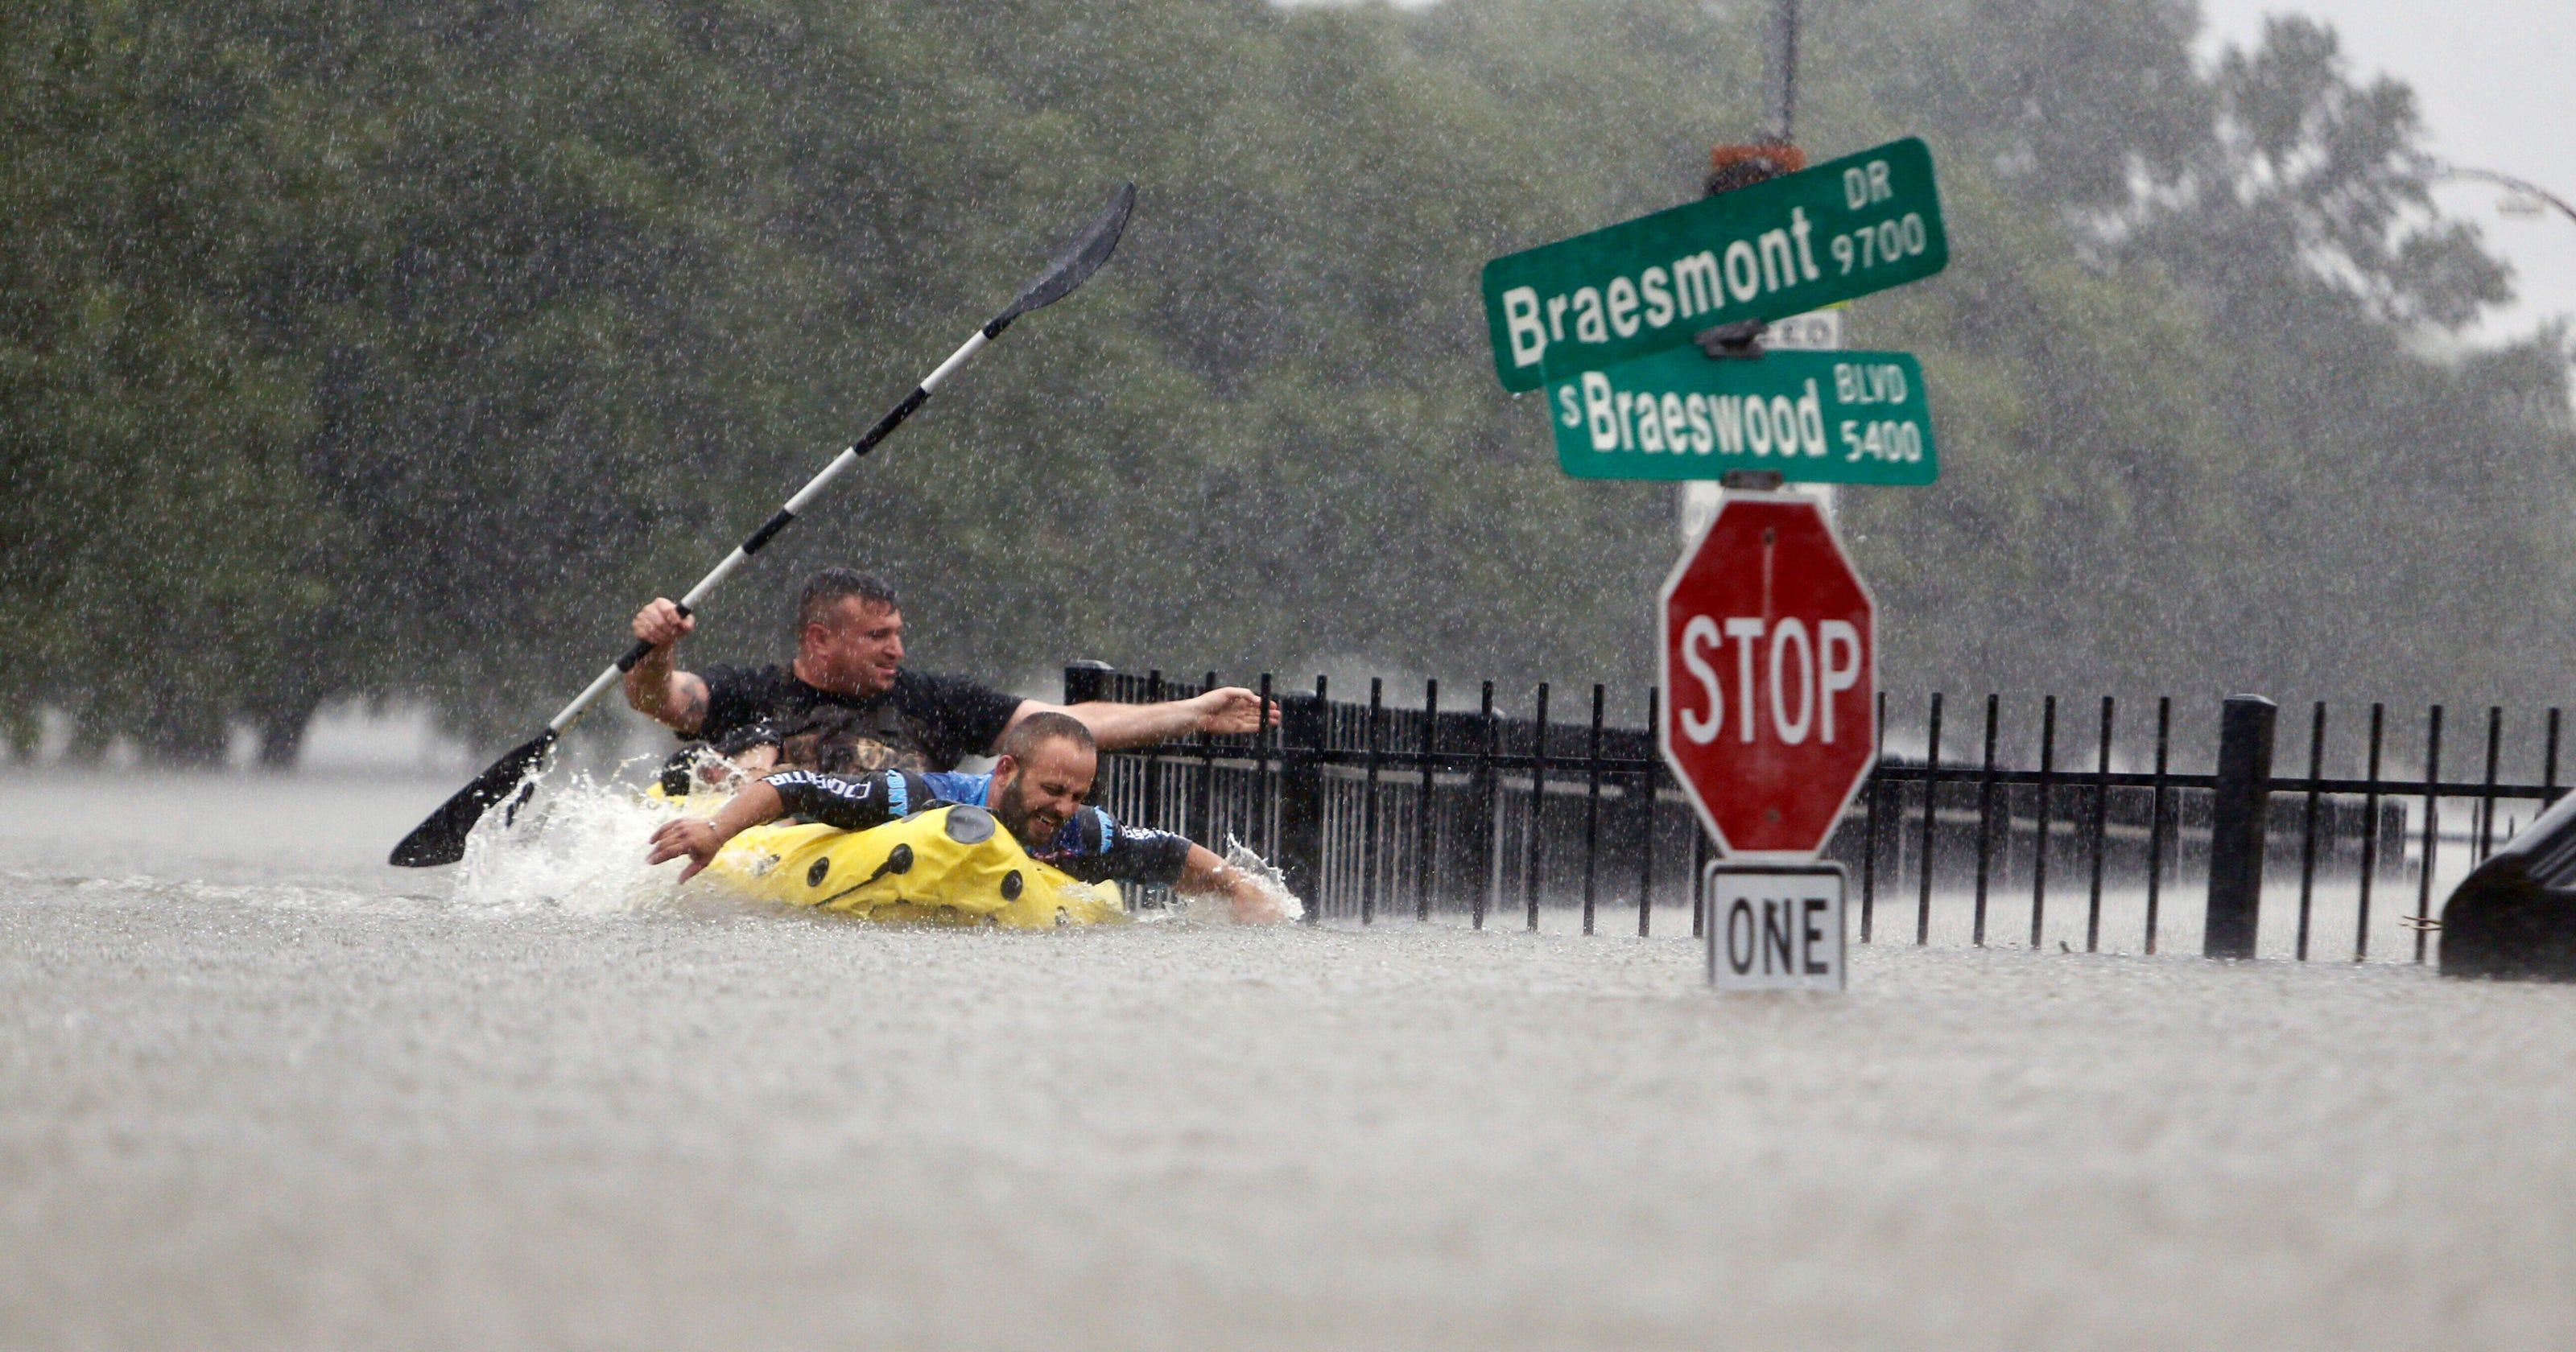 33bf1d79 Harvey floods Texas, Mayweather stays undefeated, Trump pardons ...